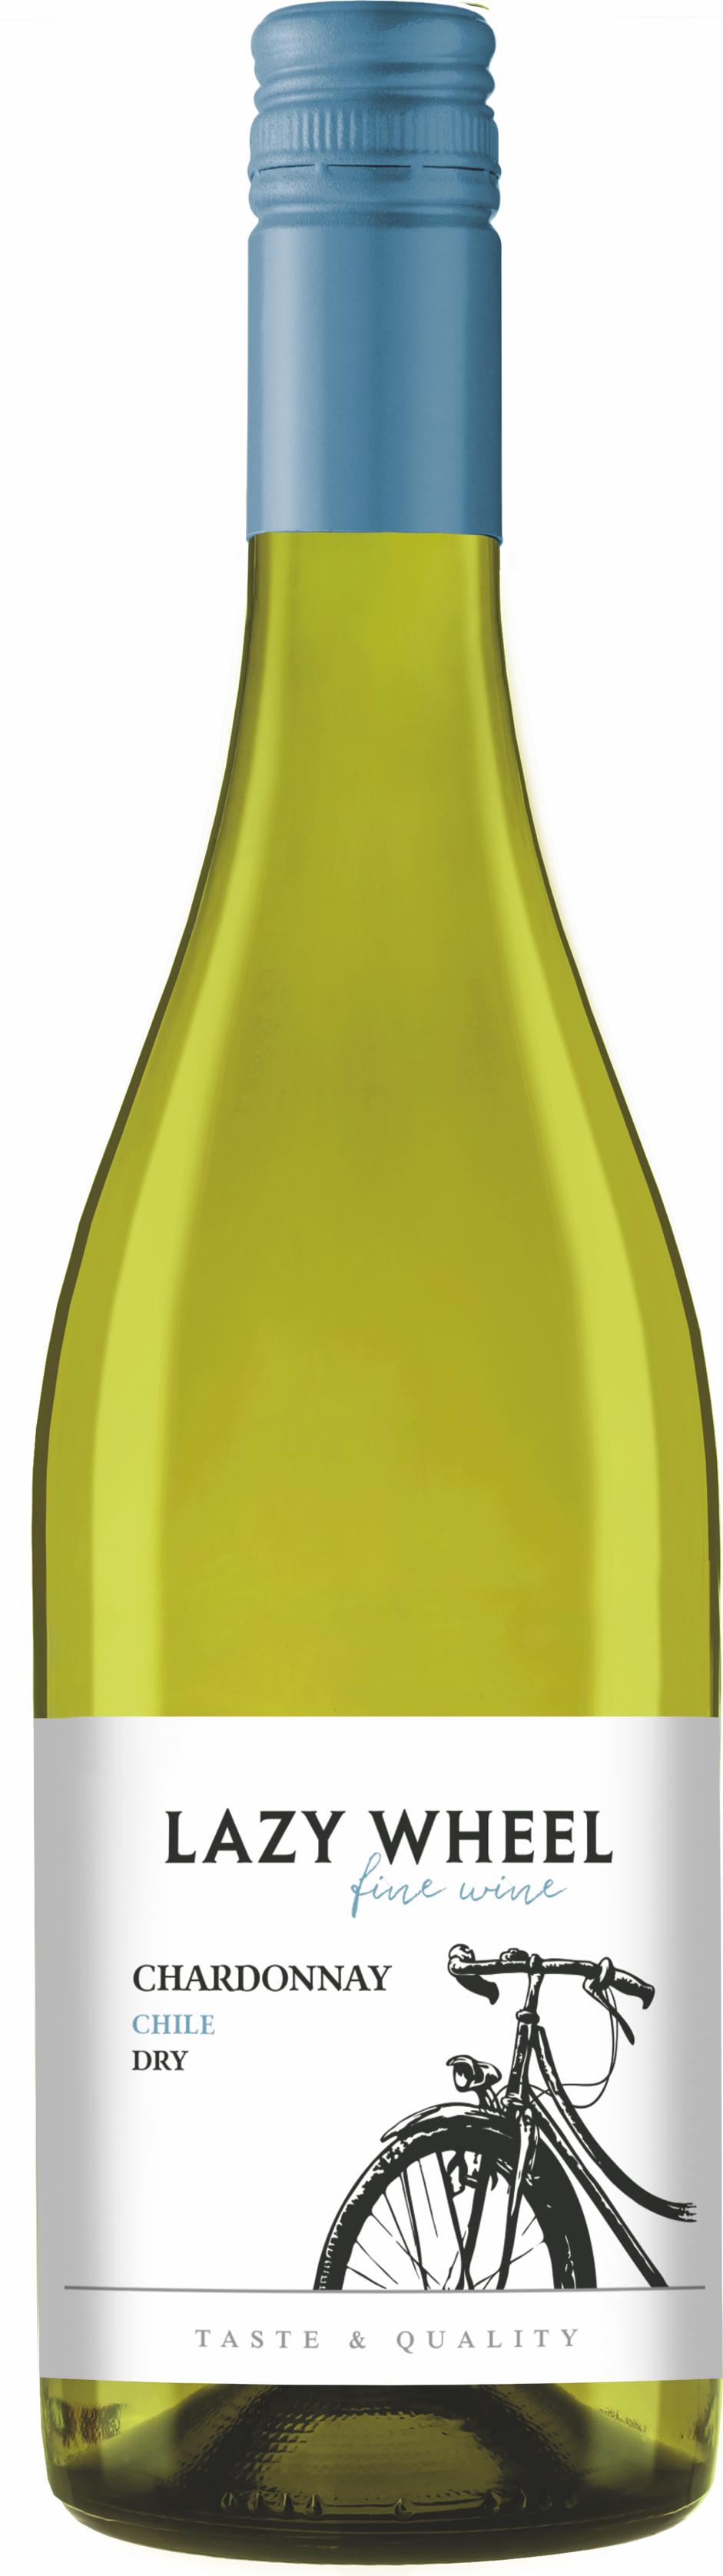 Lazy Wheel Chardonnay 0,75l